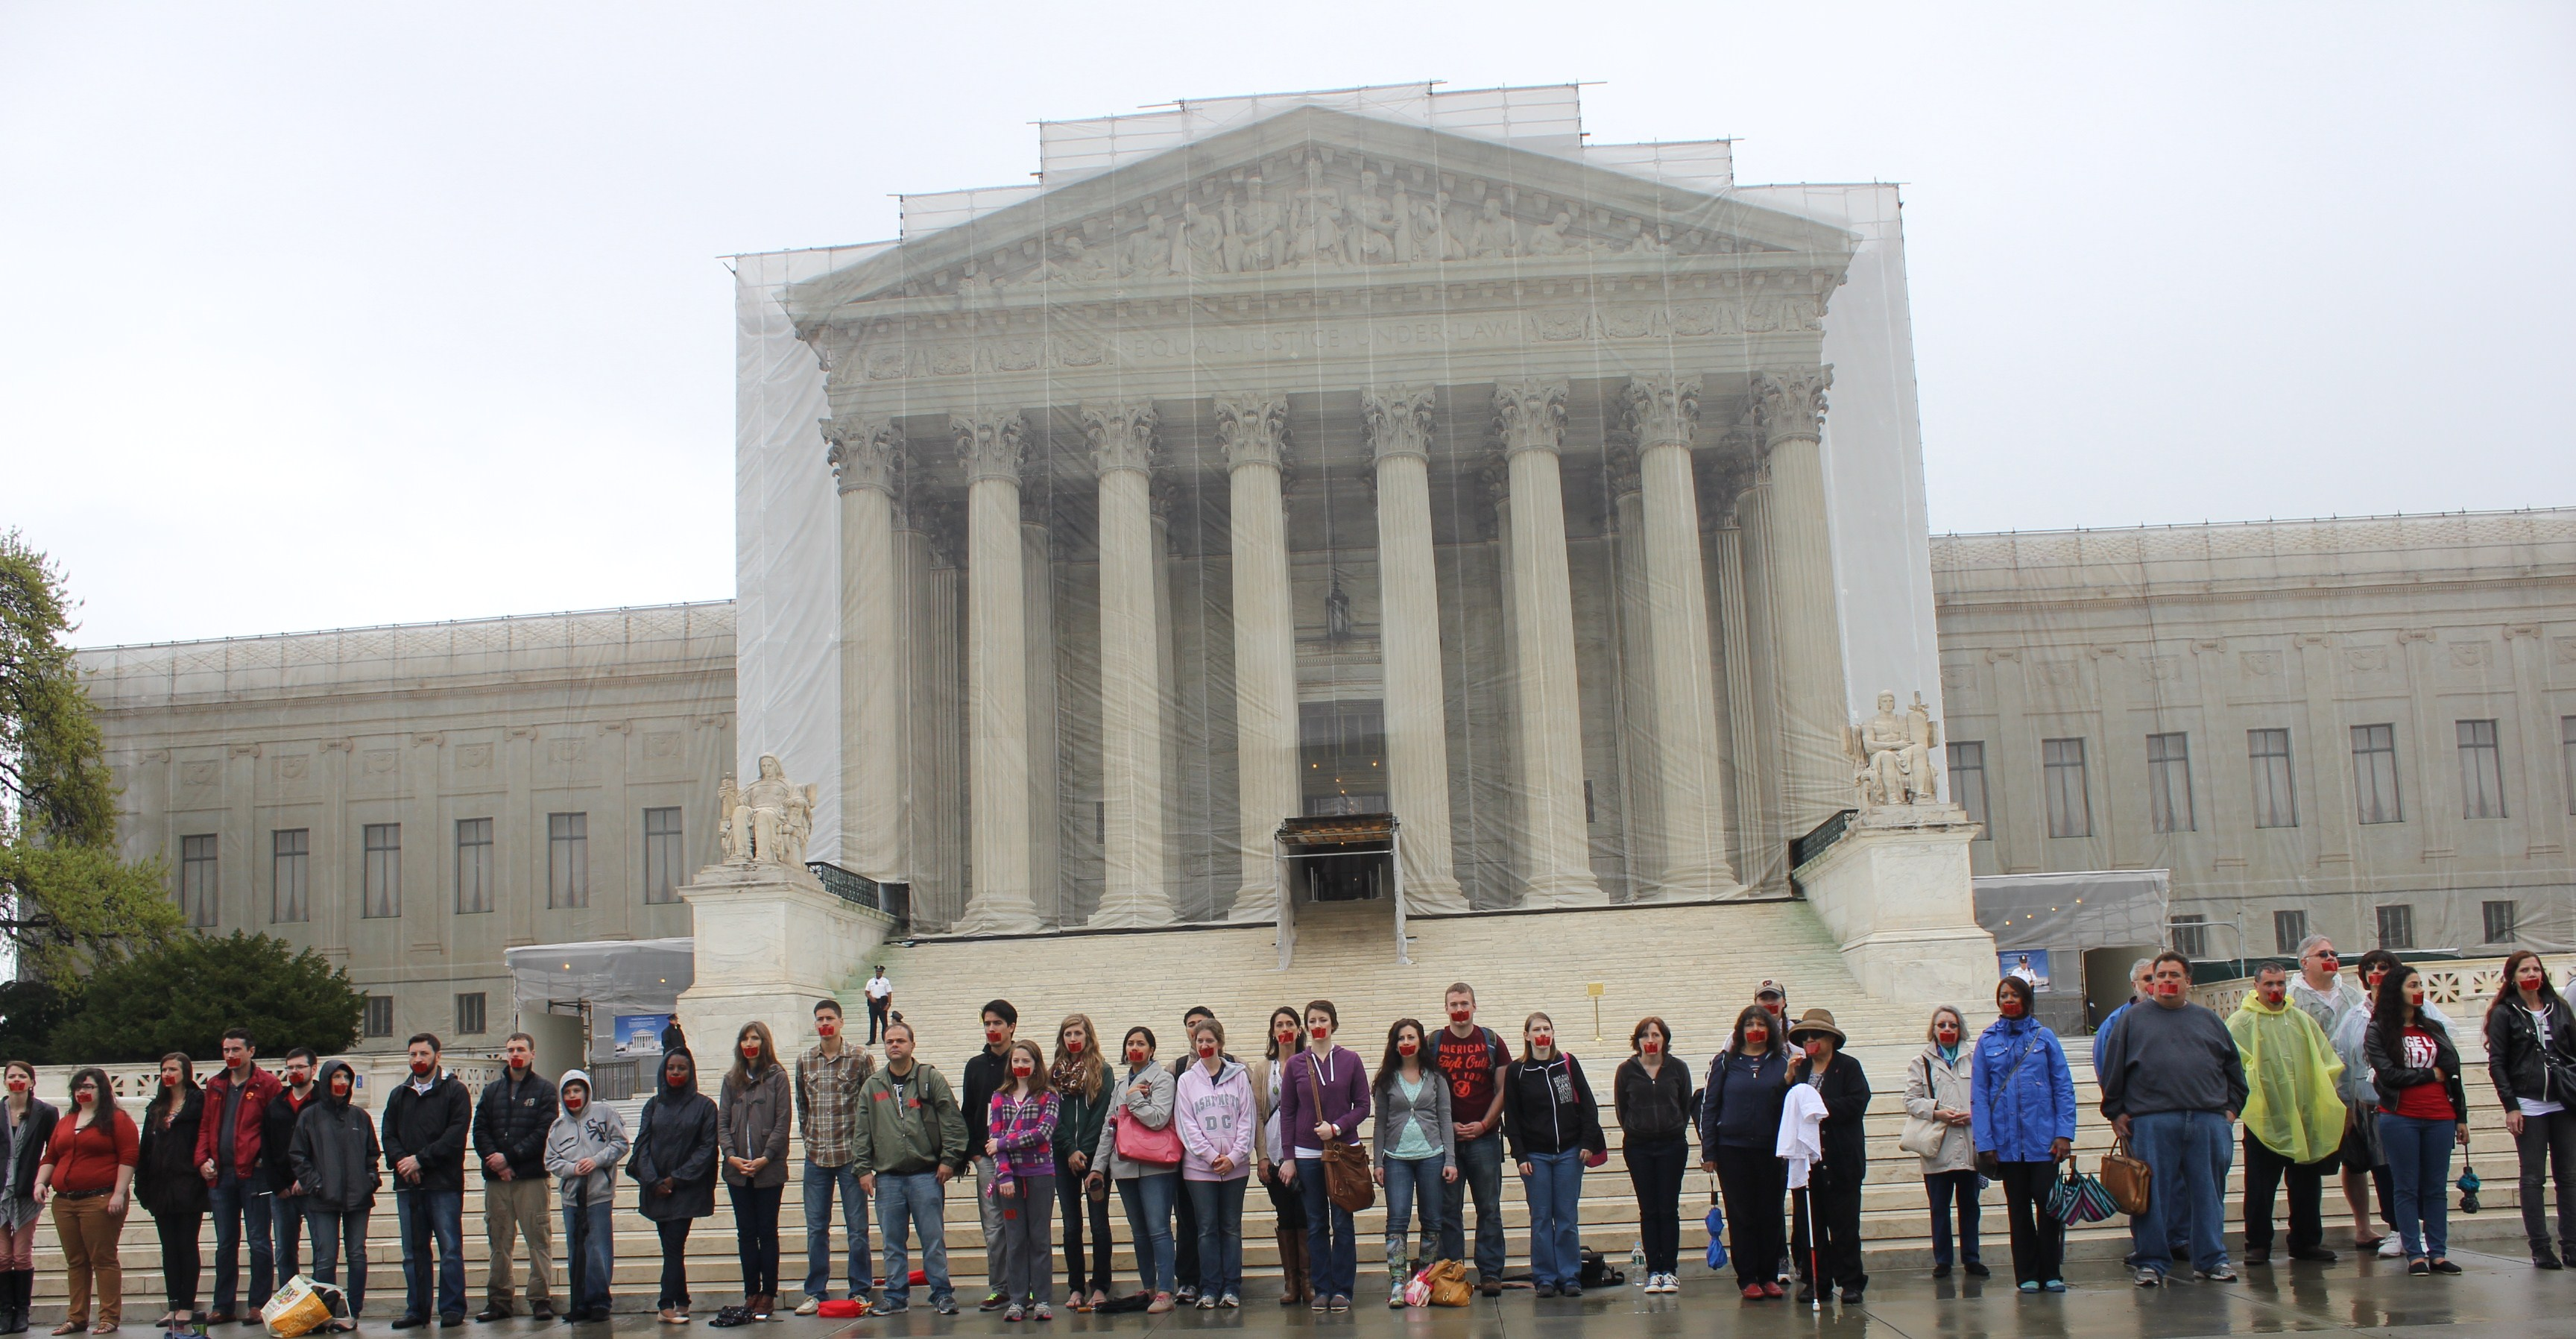 Bound4Life prayer meeting outside U.S Supreme Court